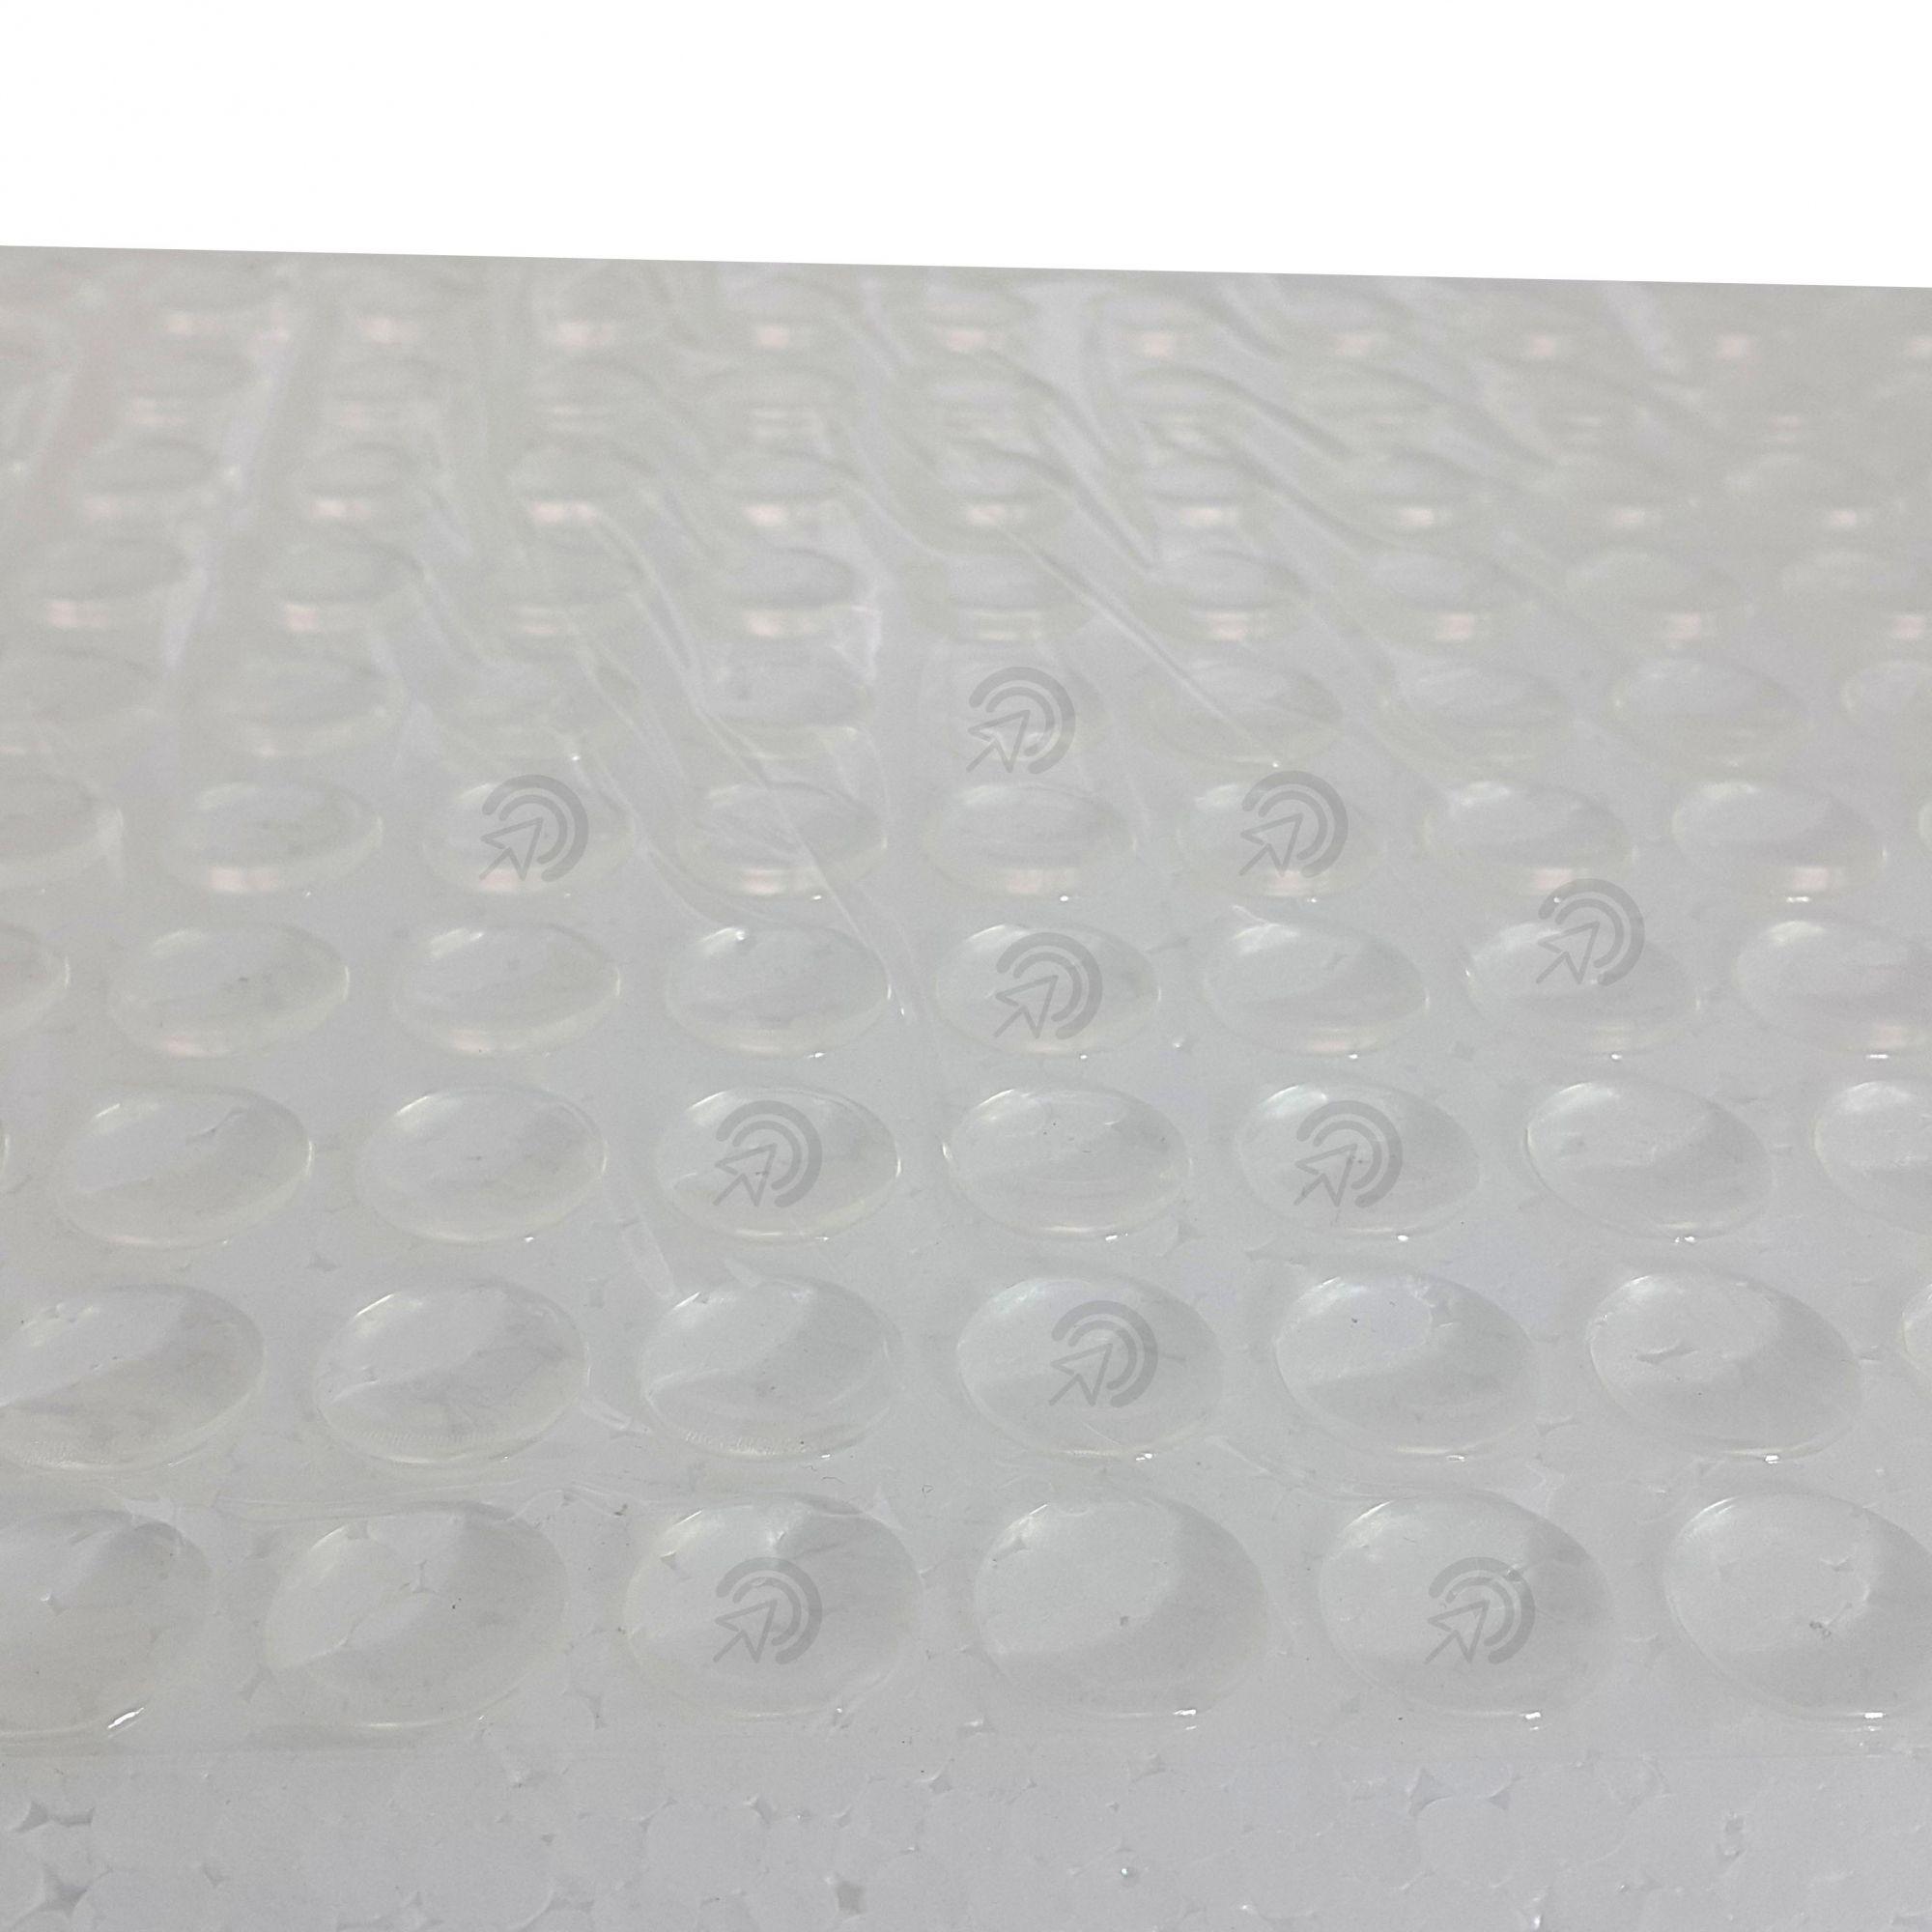 Protetor Batente De Silicone Redondo 6mm Multiuso Com Cola (gotas De Silicone)